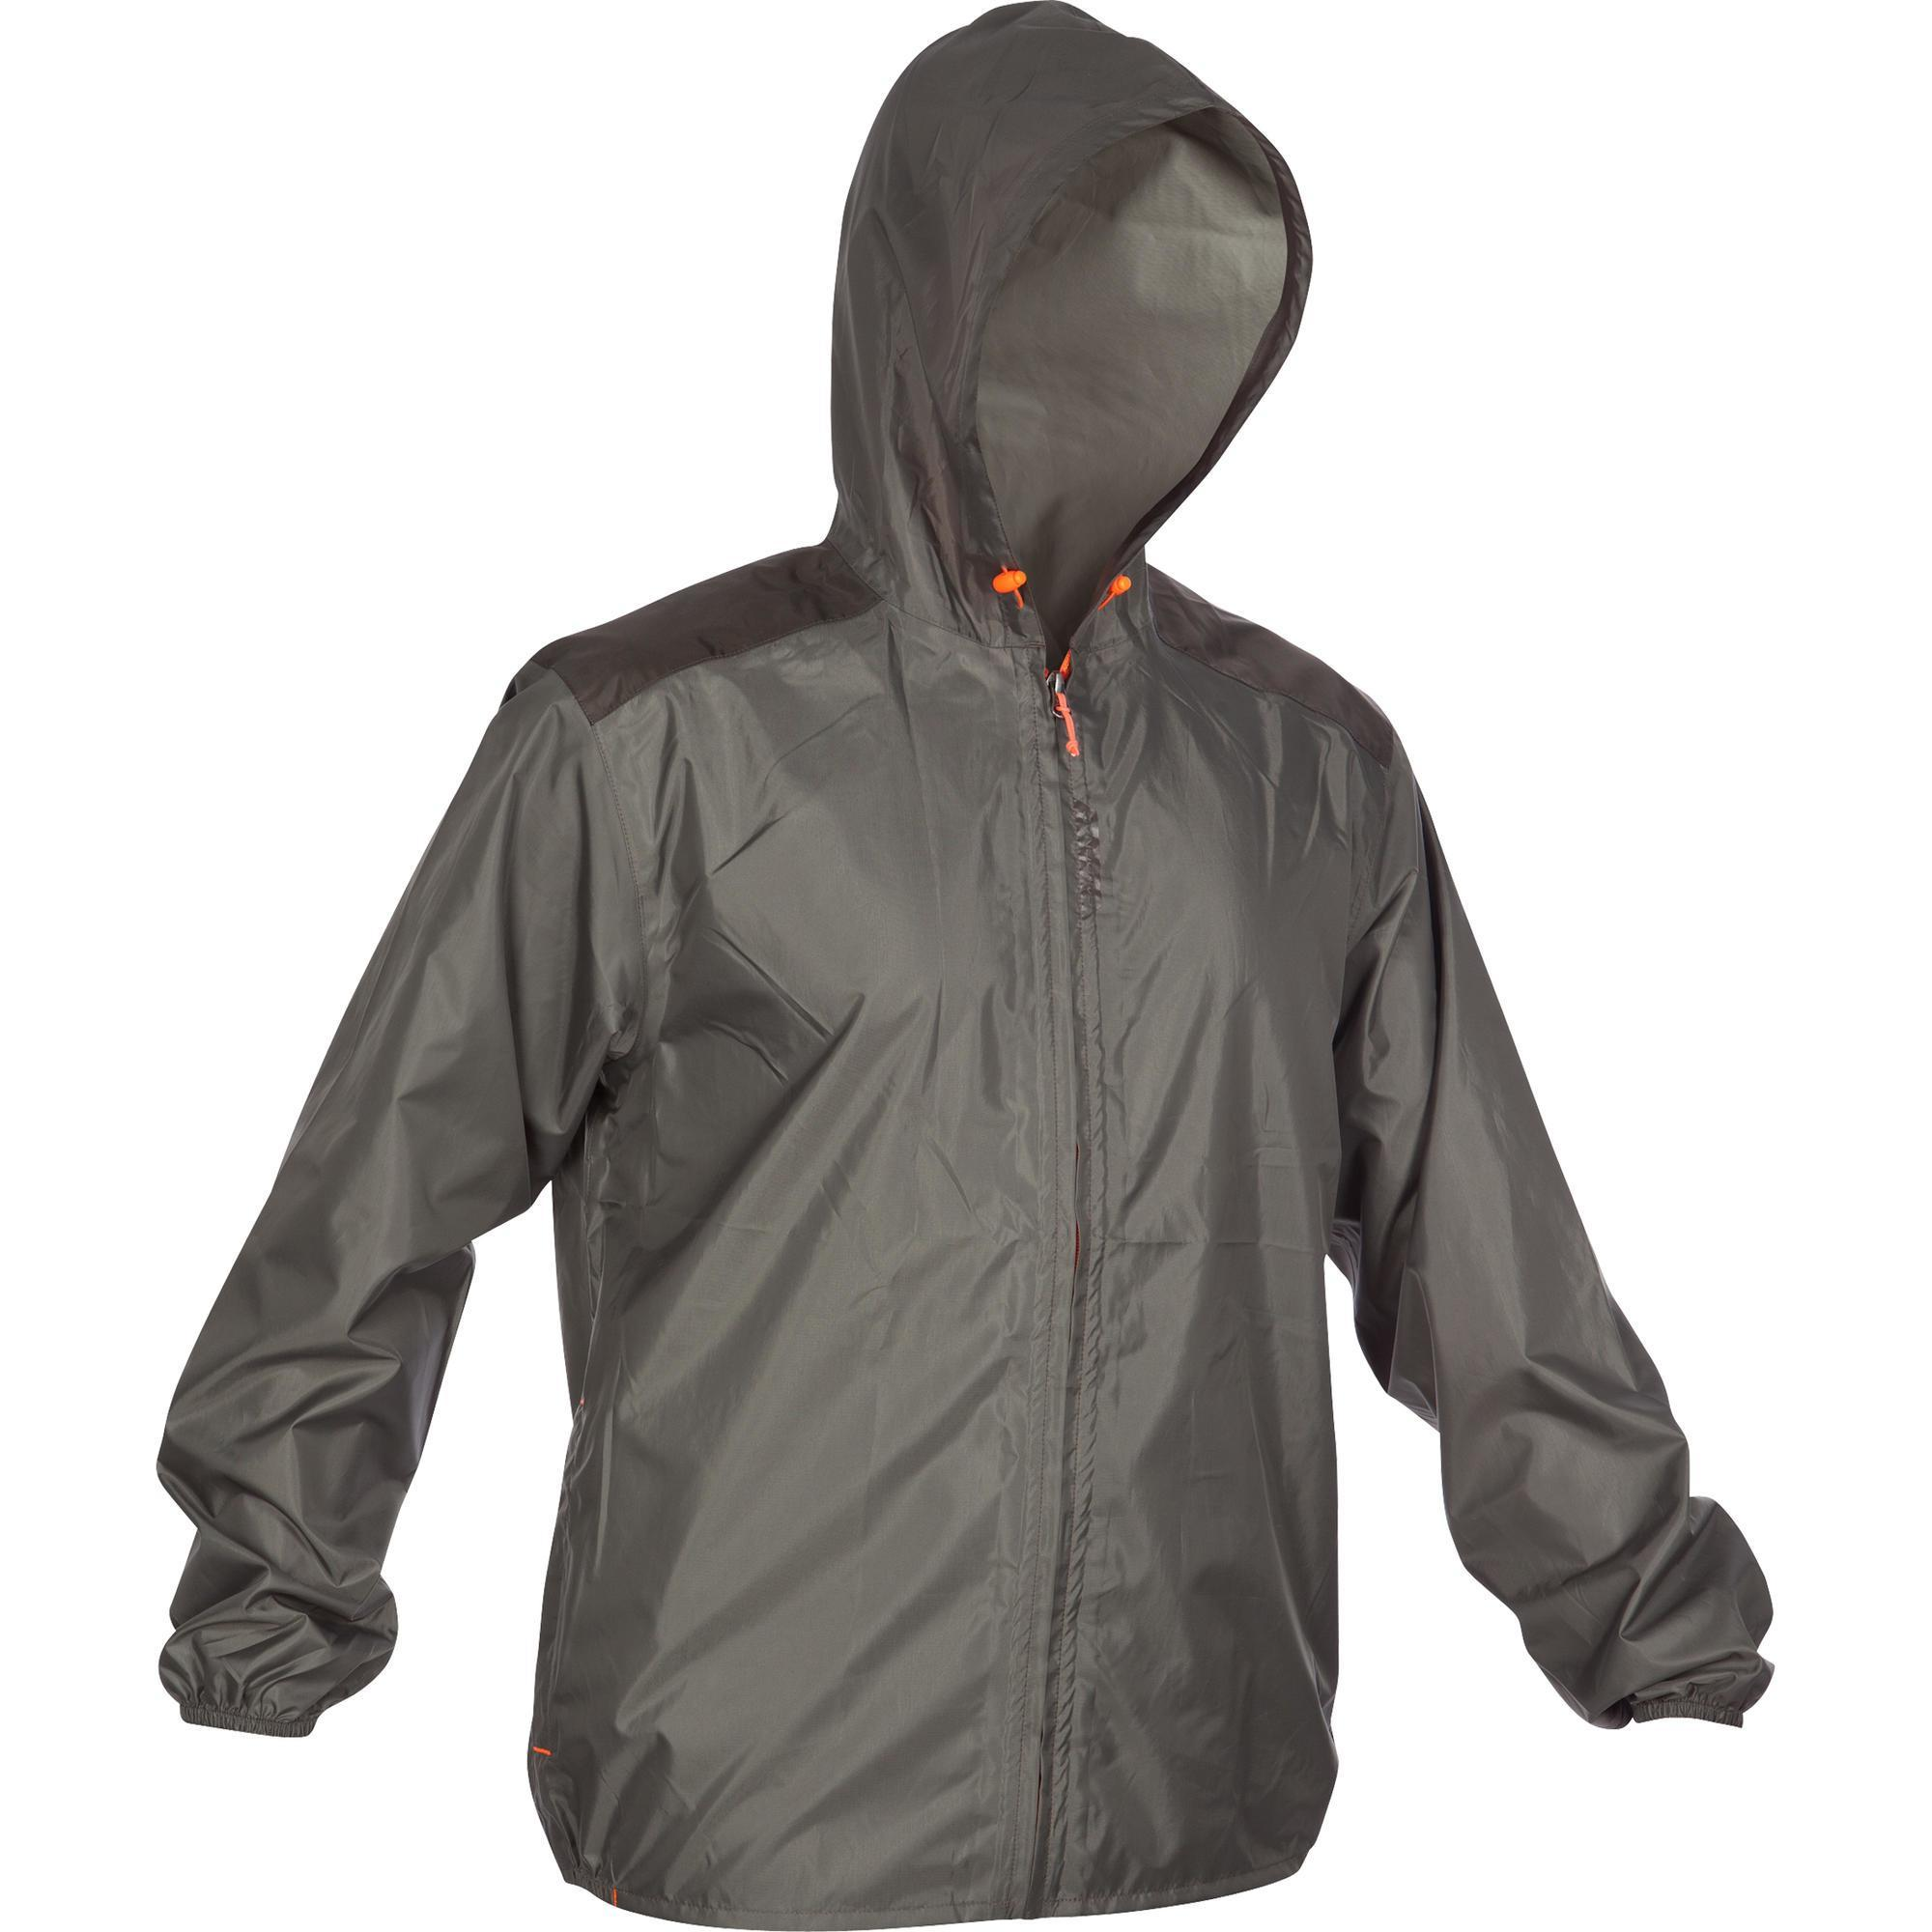 100 Waterproof Light Hunting Jacket - Khaki